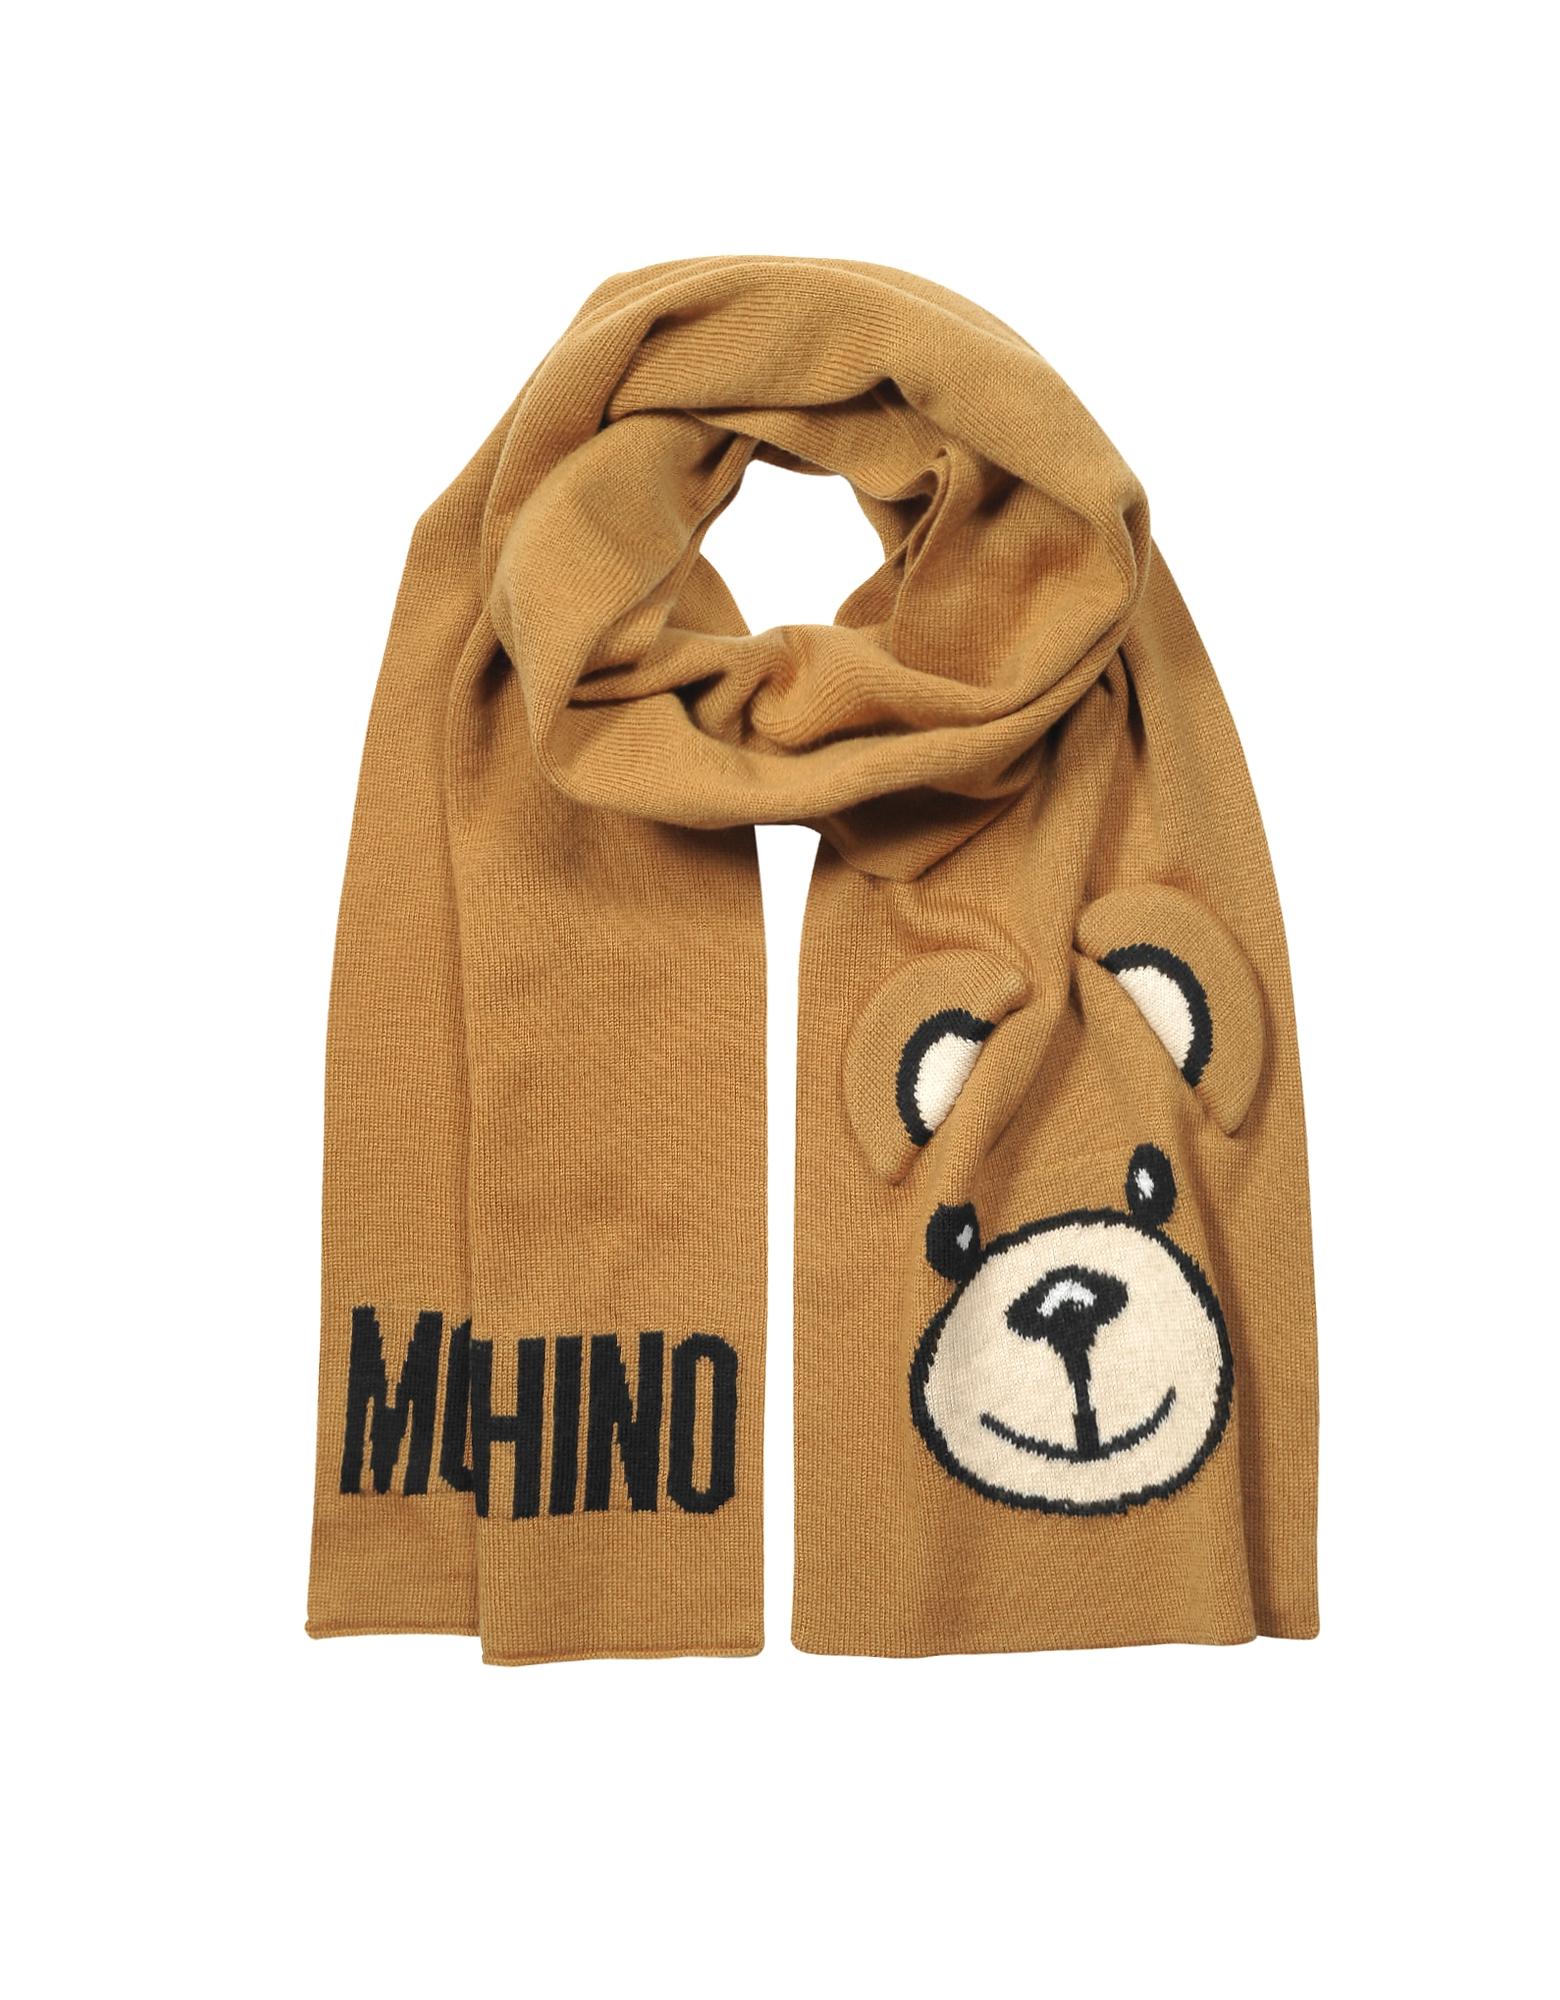 Moschino Teddy Bear Ears Scarf